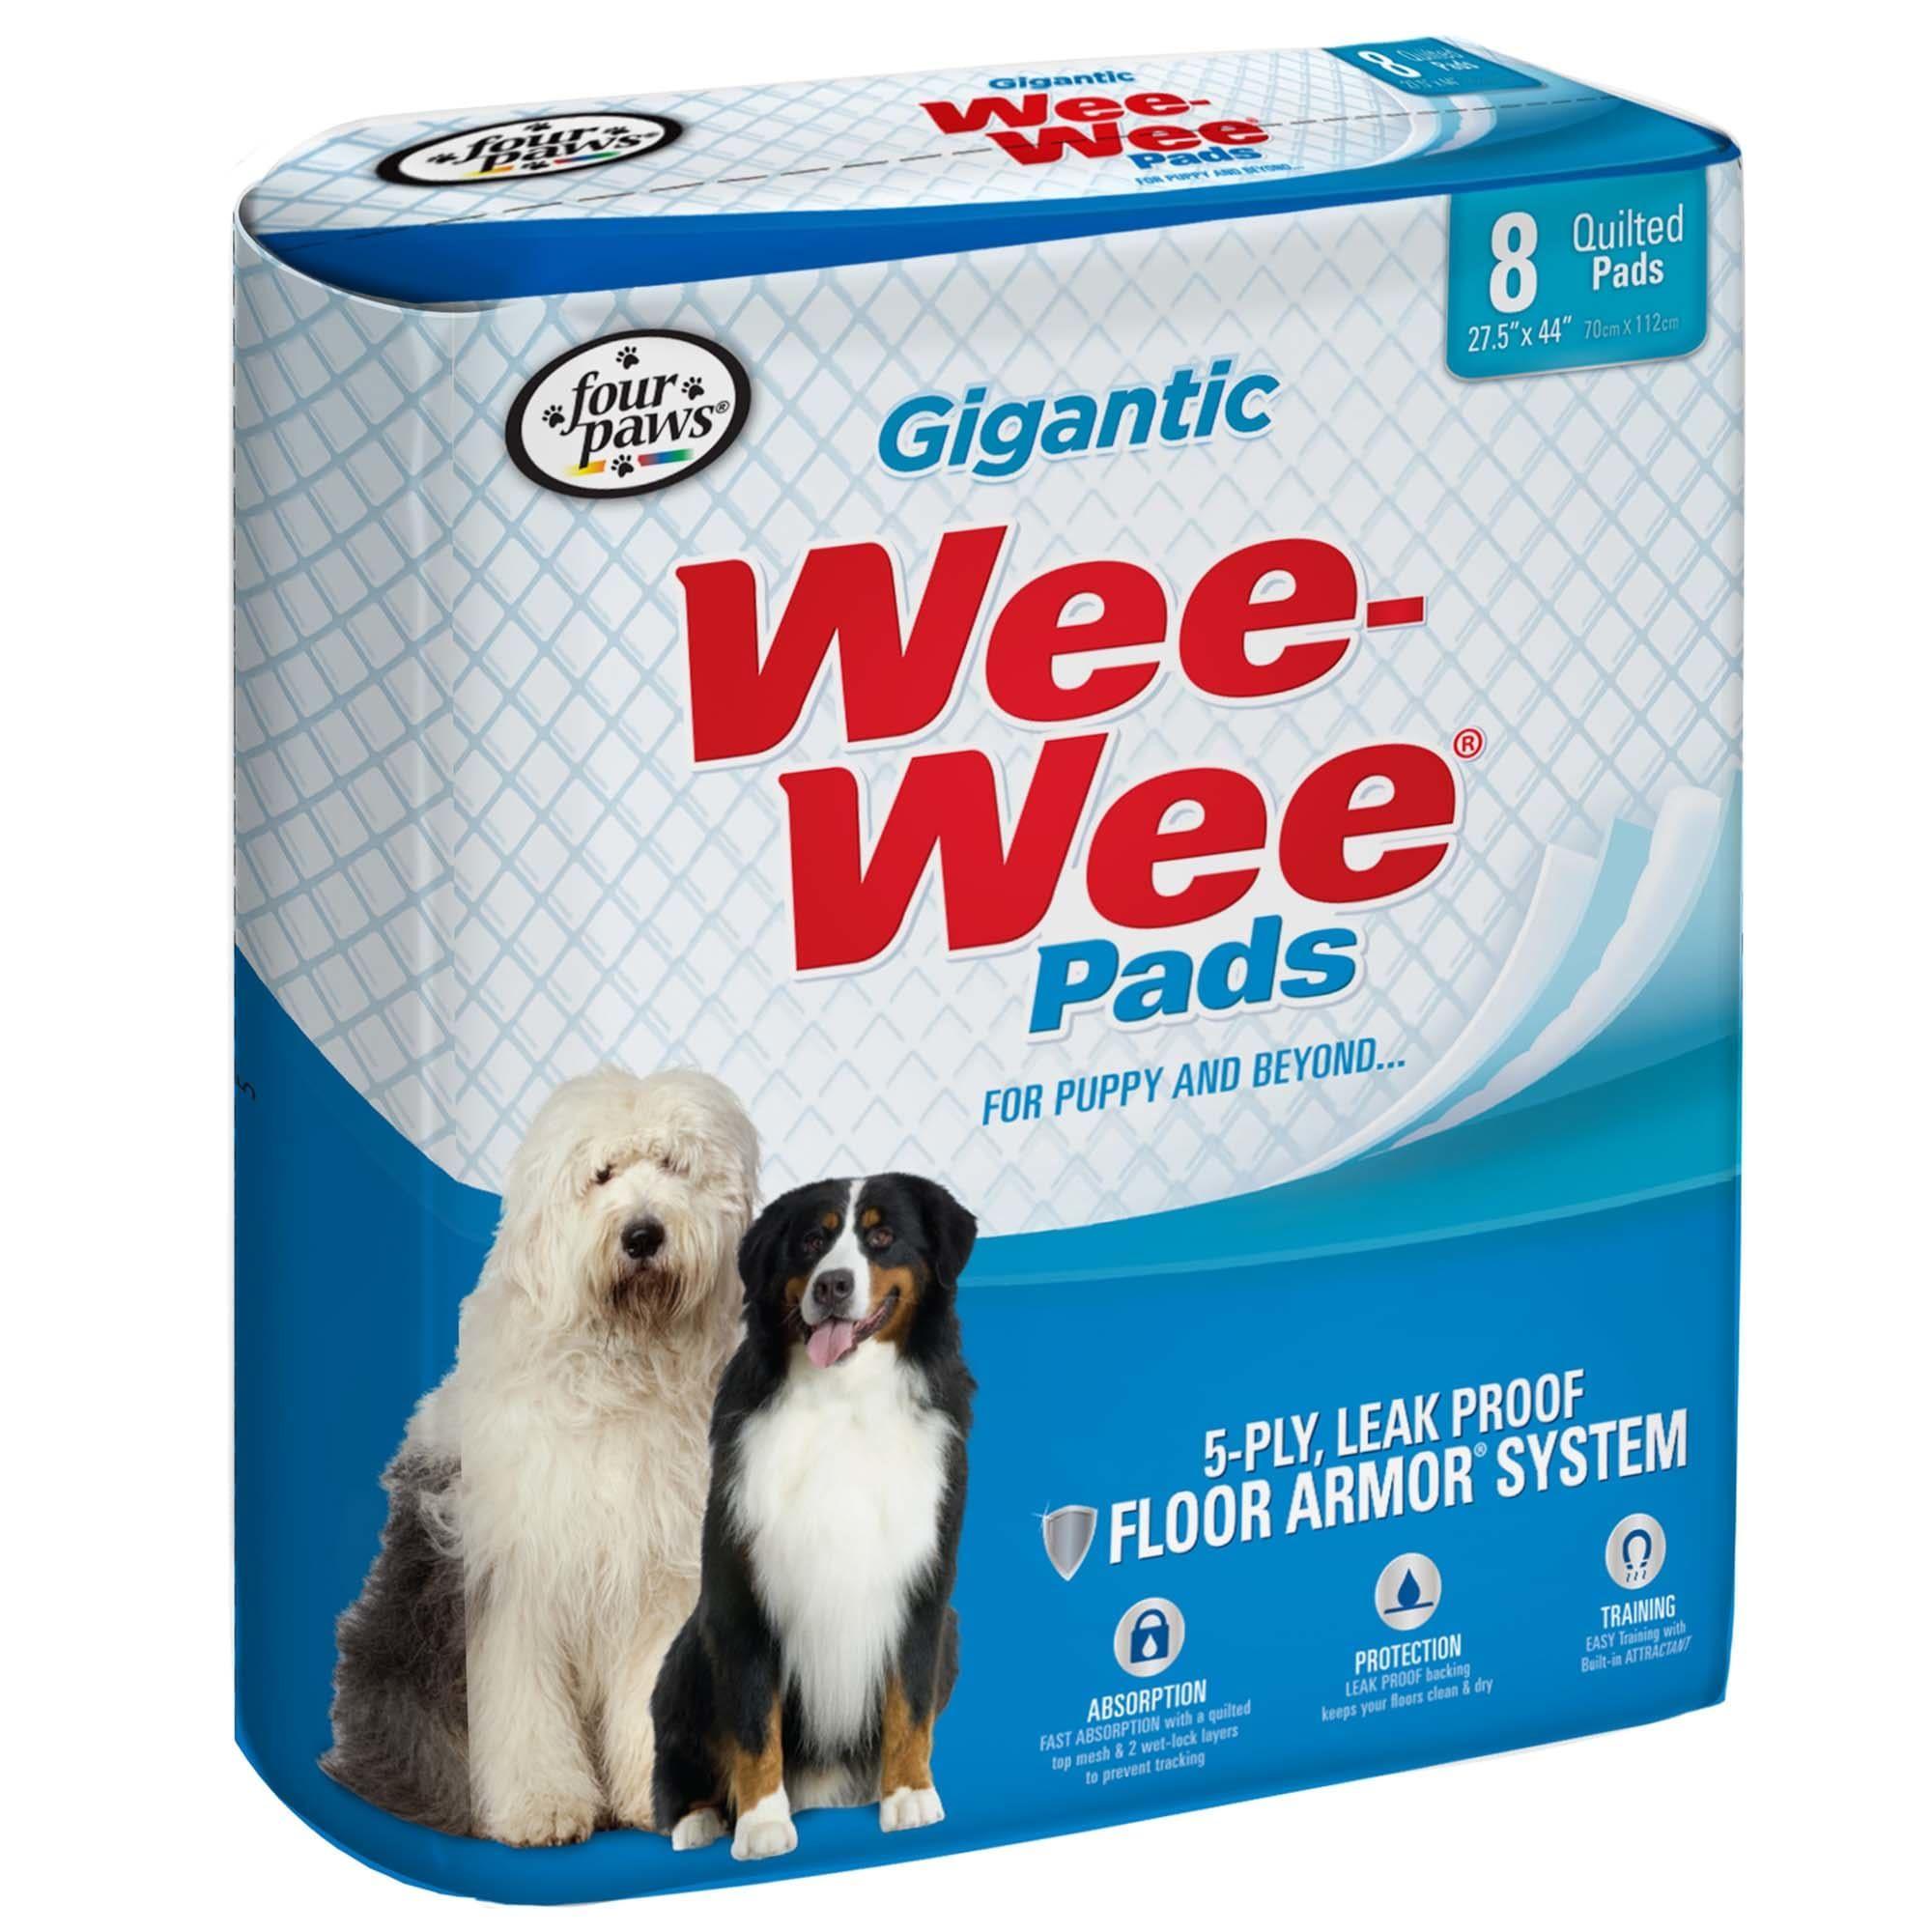 Wee Wee Pads Gigantic Puppy Housebreaking Pads 8 Ct In 2020